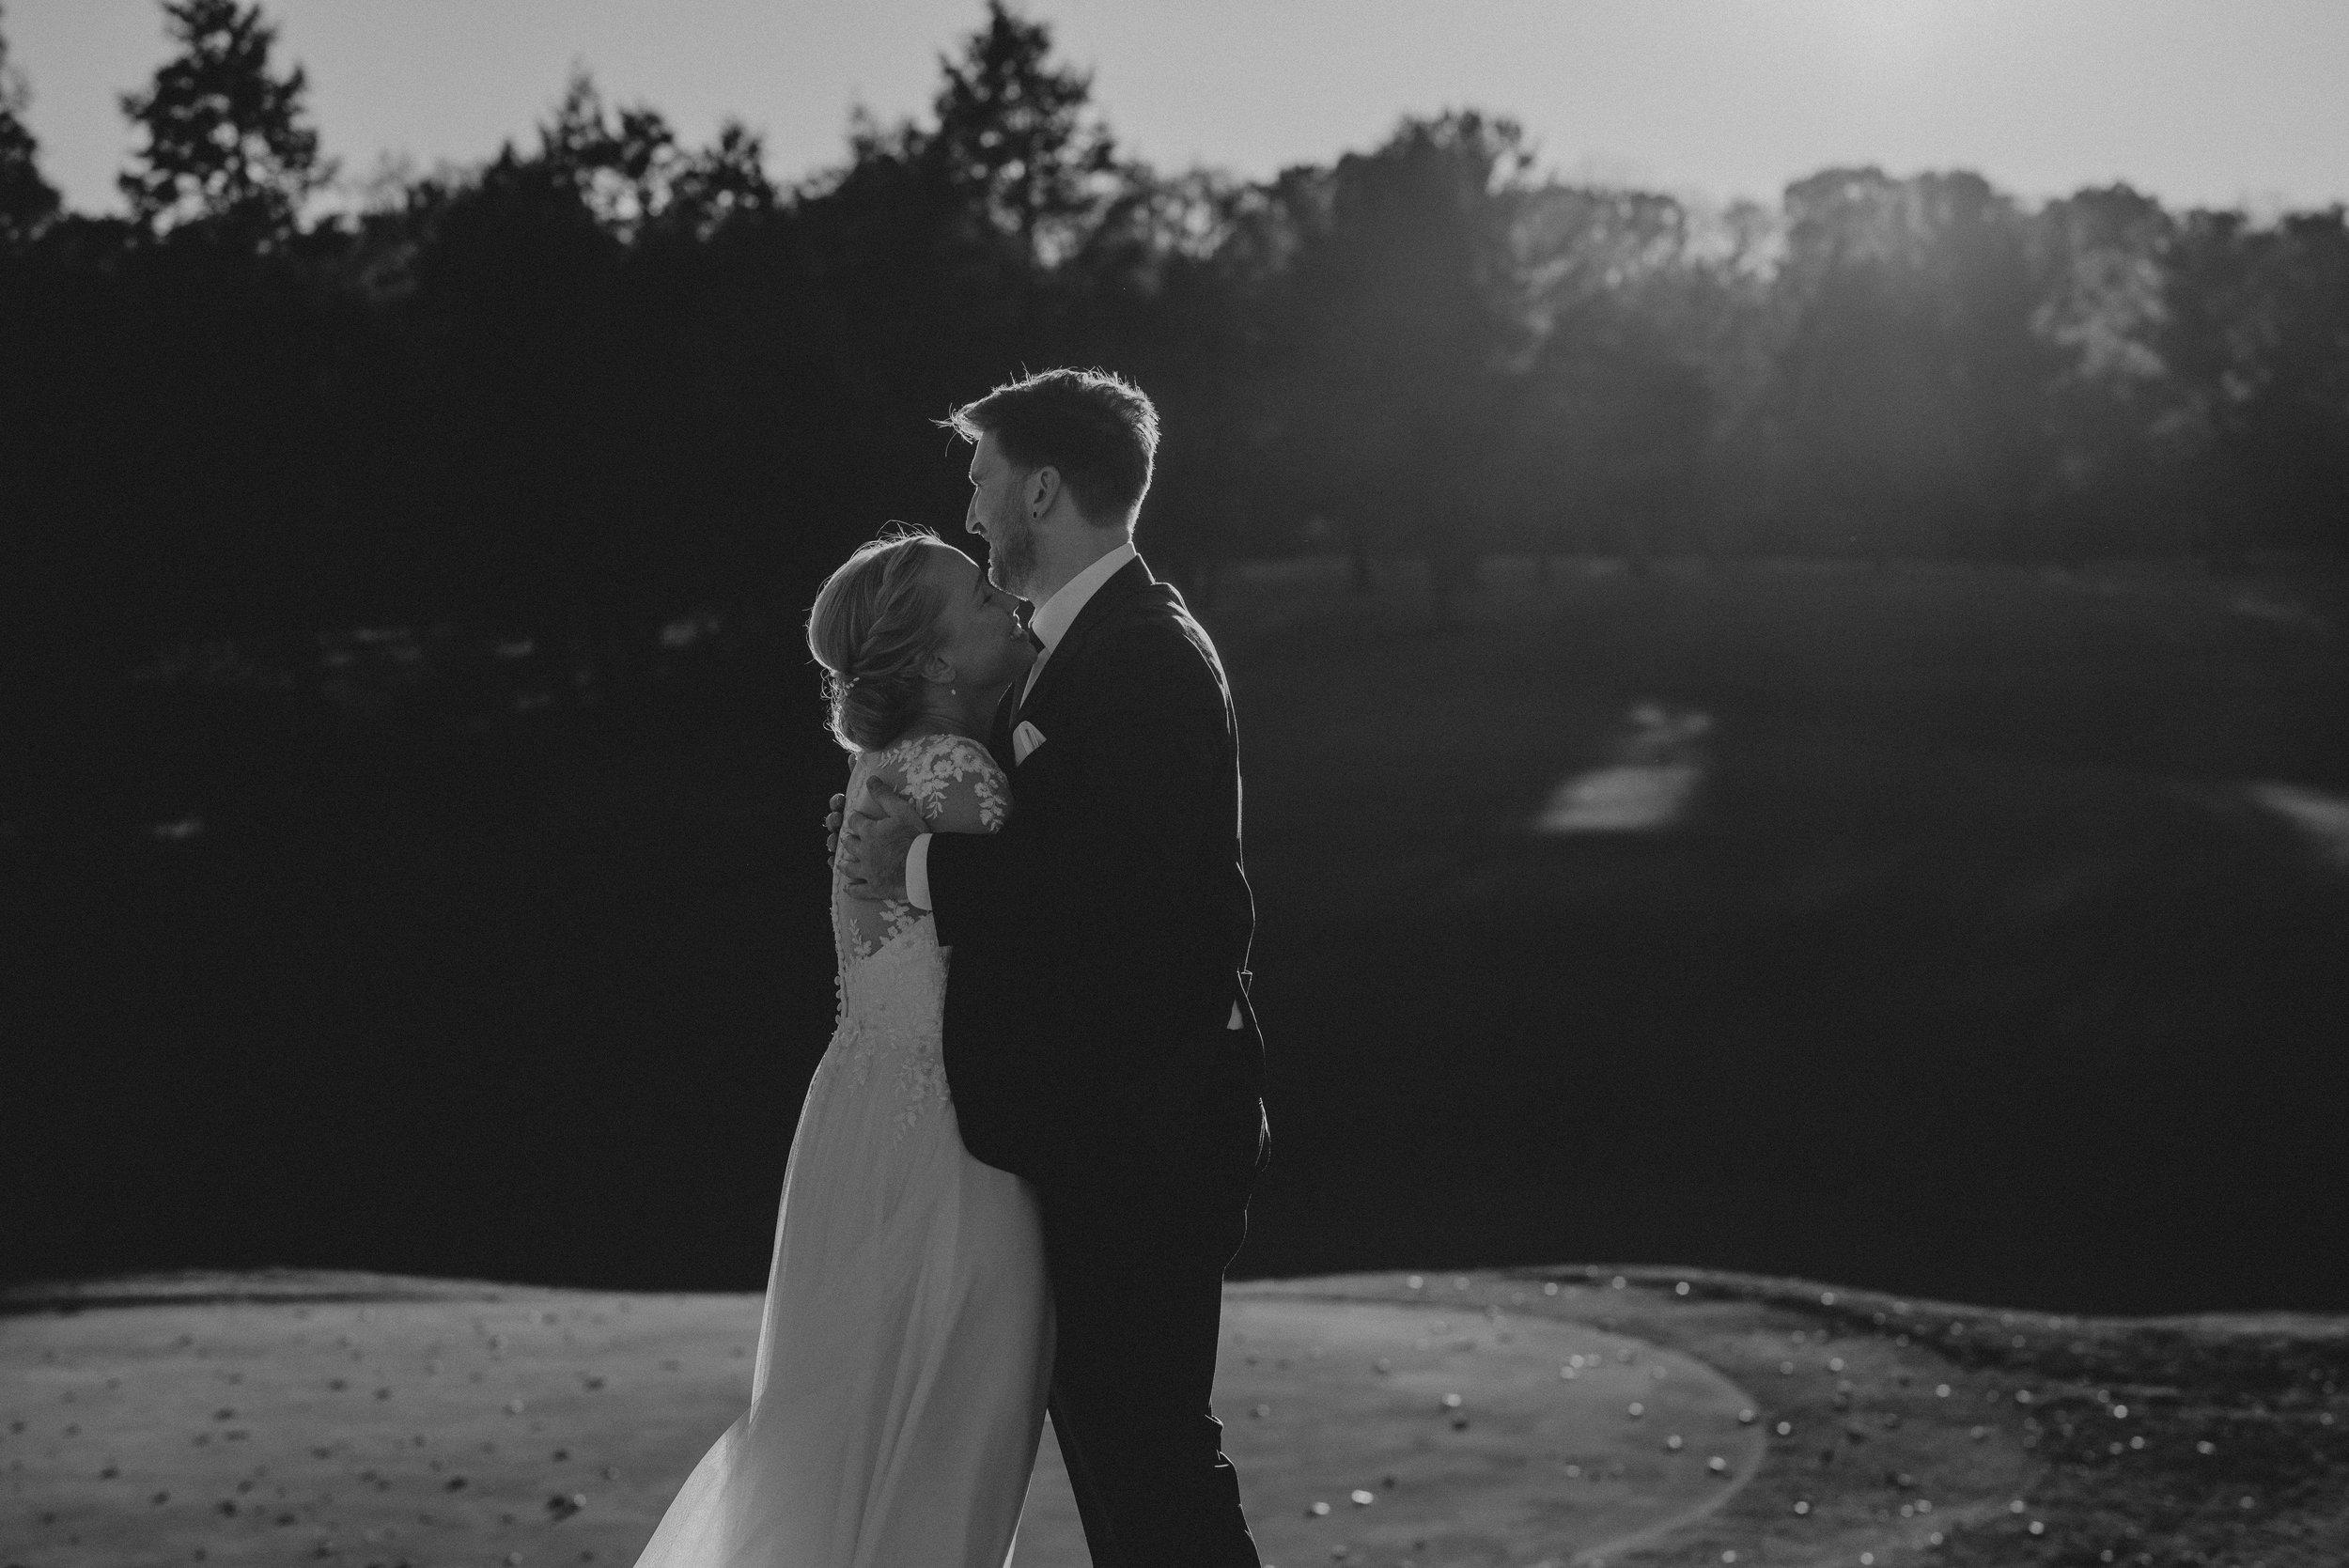 ApkePhotography_K+M_Wedding_33.jpg